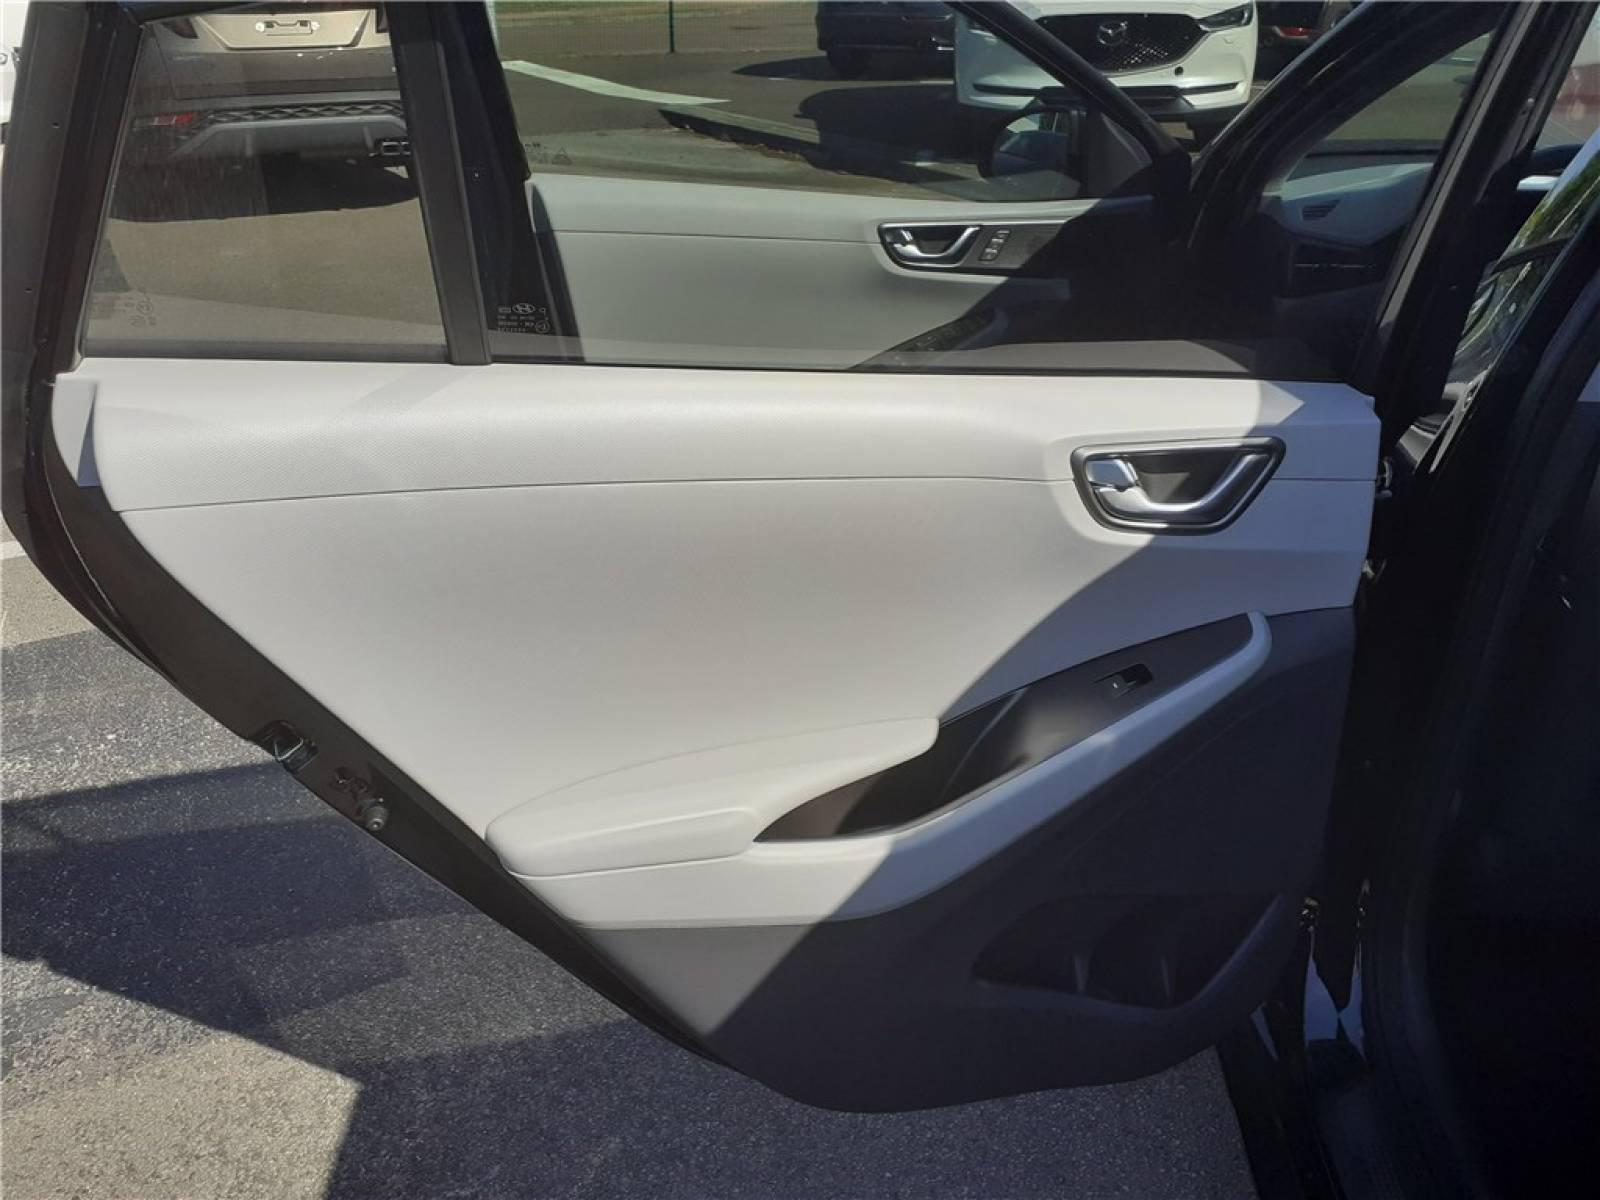 HYUNDAI Ioniq Plug-in 141 ch - véhicule d'occasion - Groupe Guillet - Chalon Automobiles - 71100 - Chalon-sur-Saône - 30